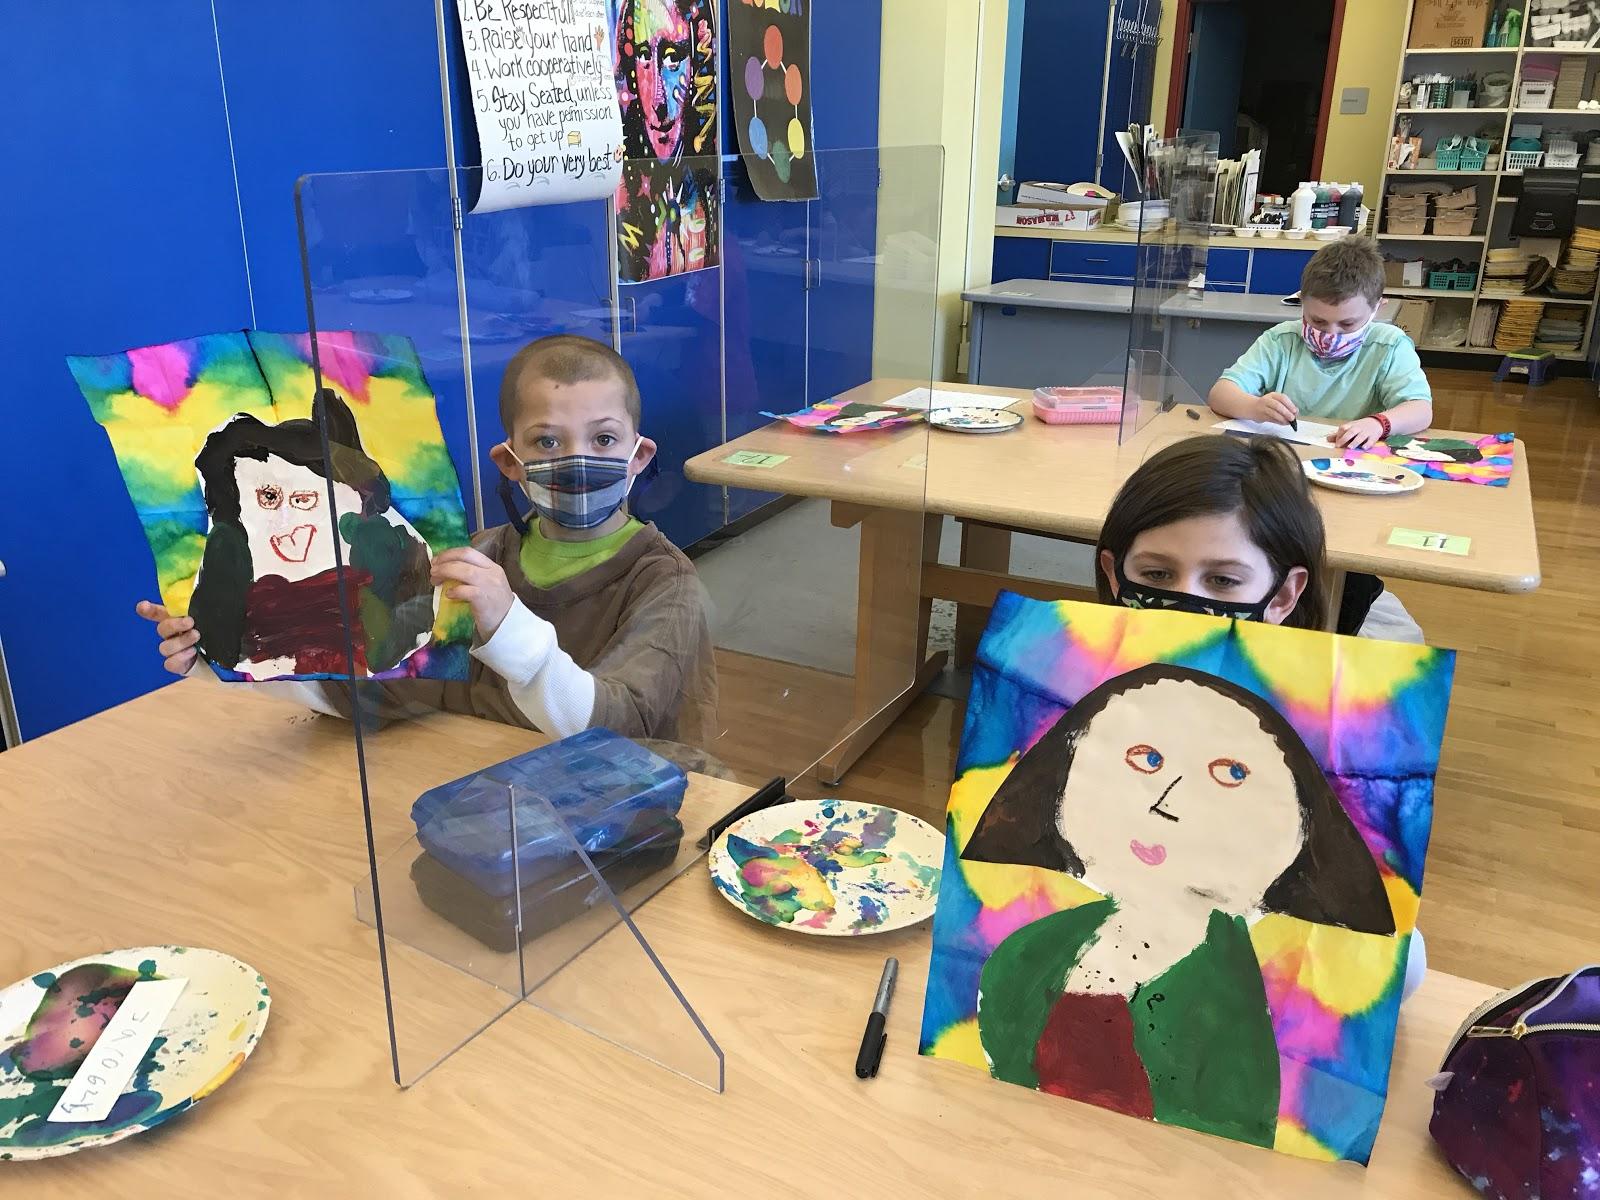 Genet art students